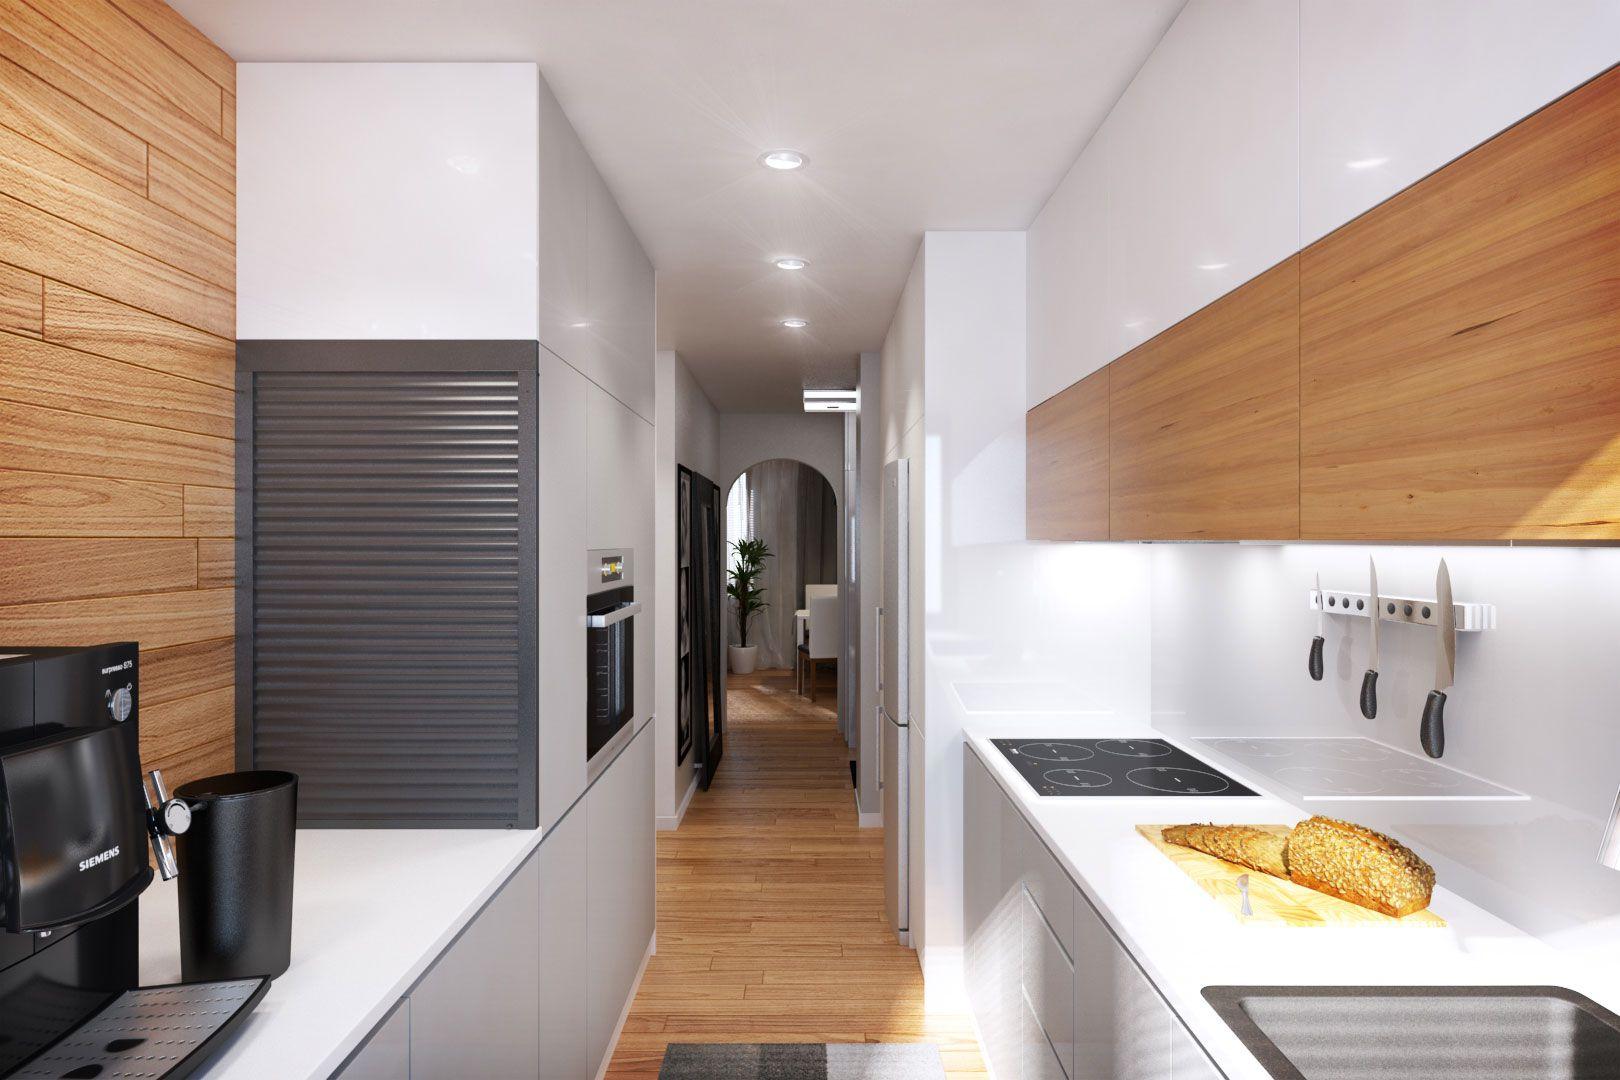 Dise o departamento peque o 62 m planos construye hogar for Planos y diseno de muebles